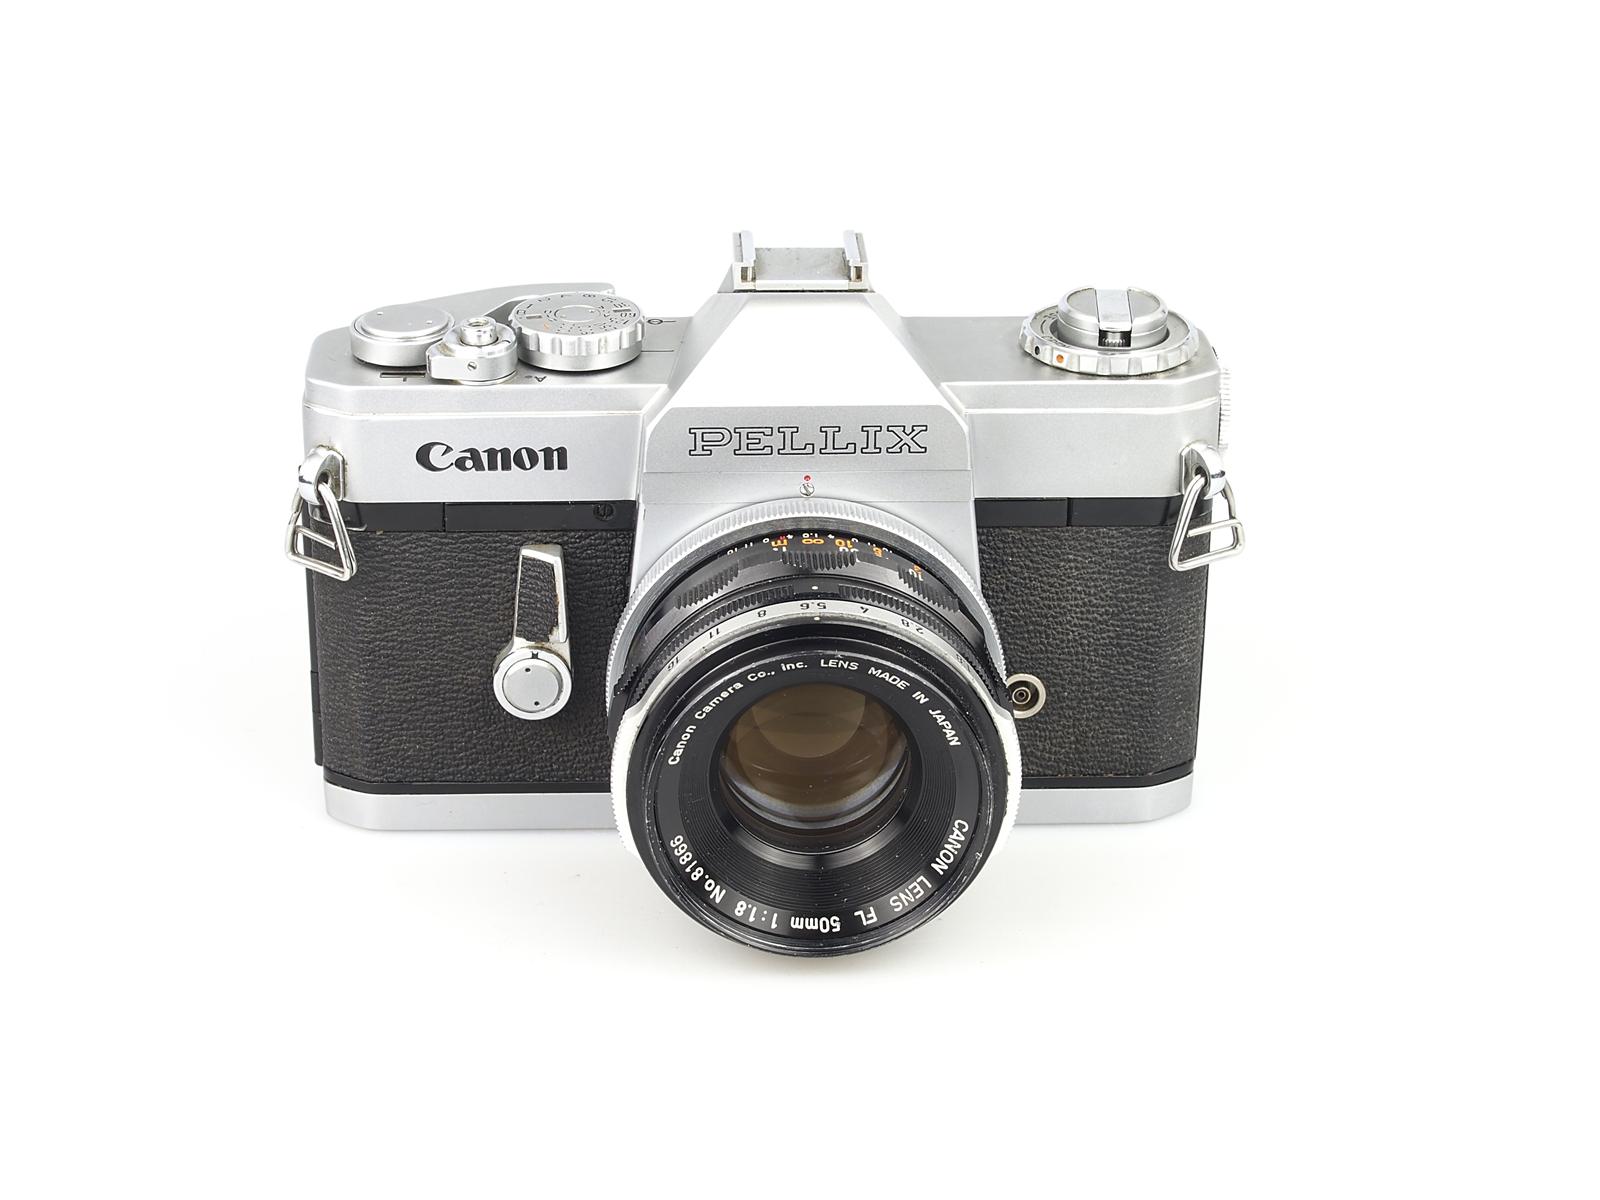 Canon Pellix (Japan, 1965)